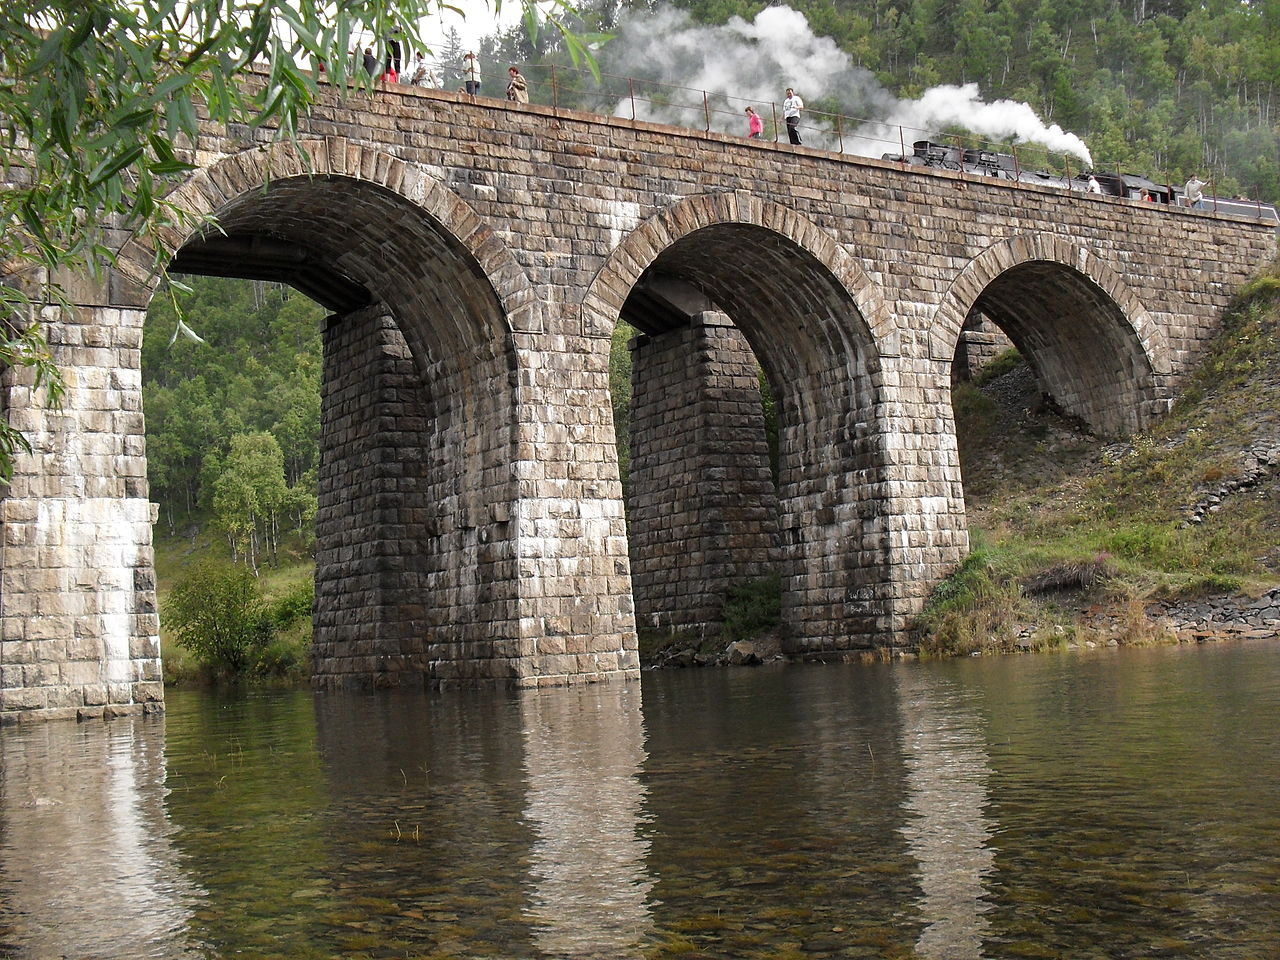 Кругобайкальская железная дорога, мост